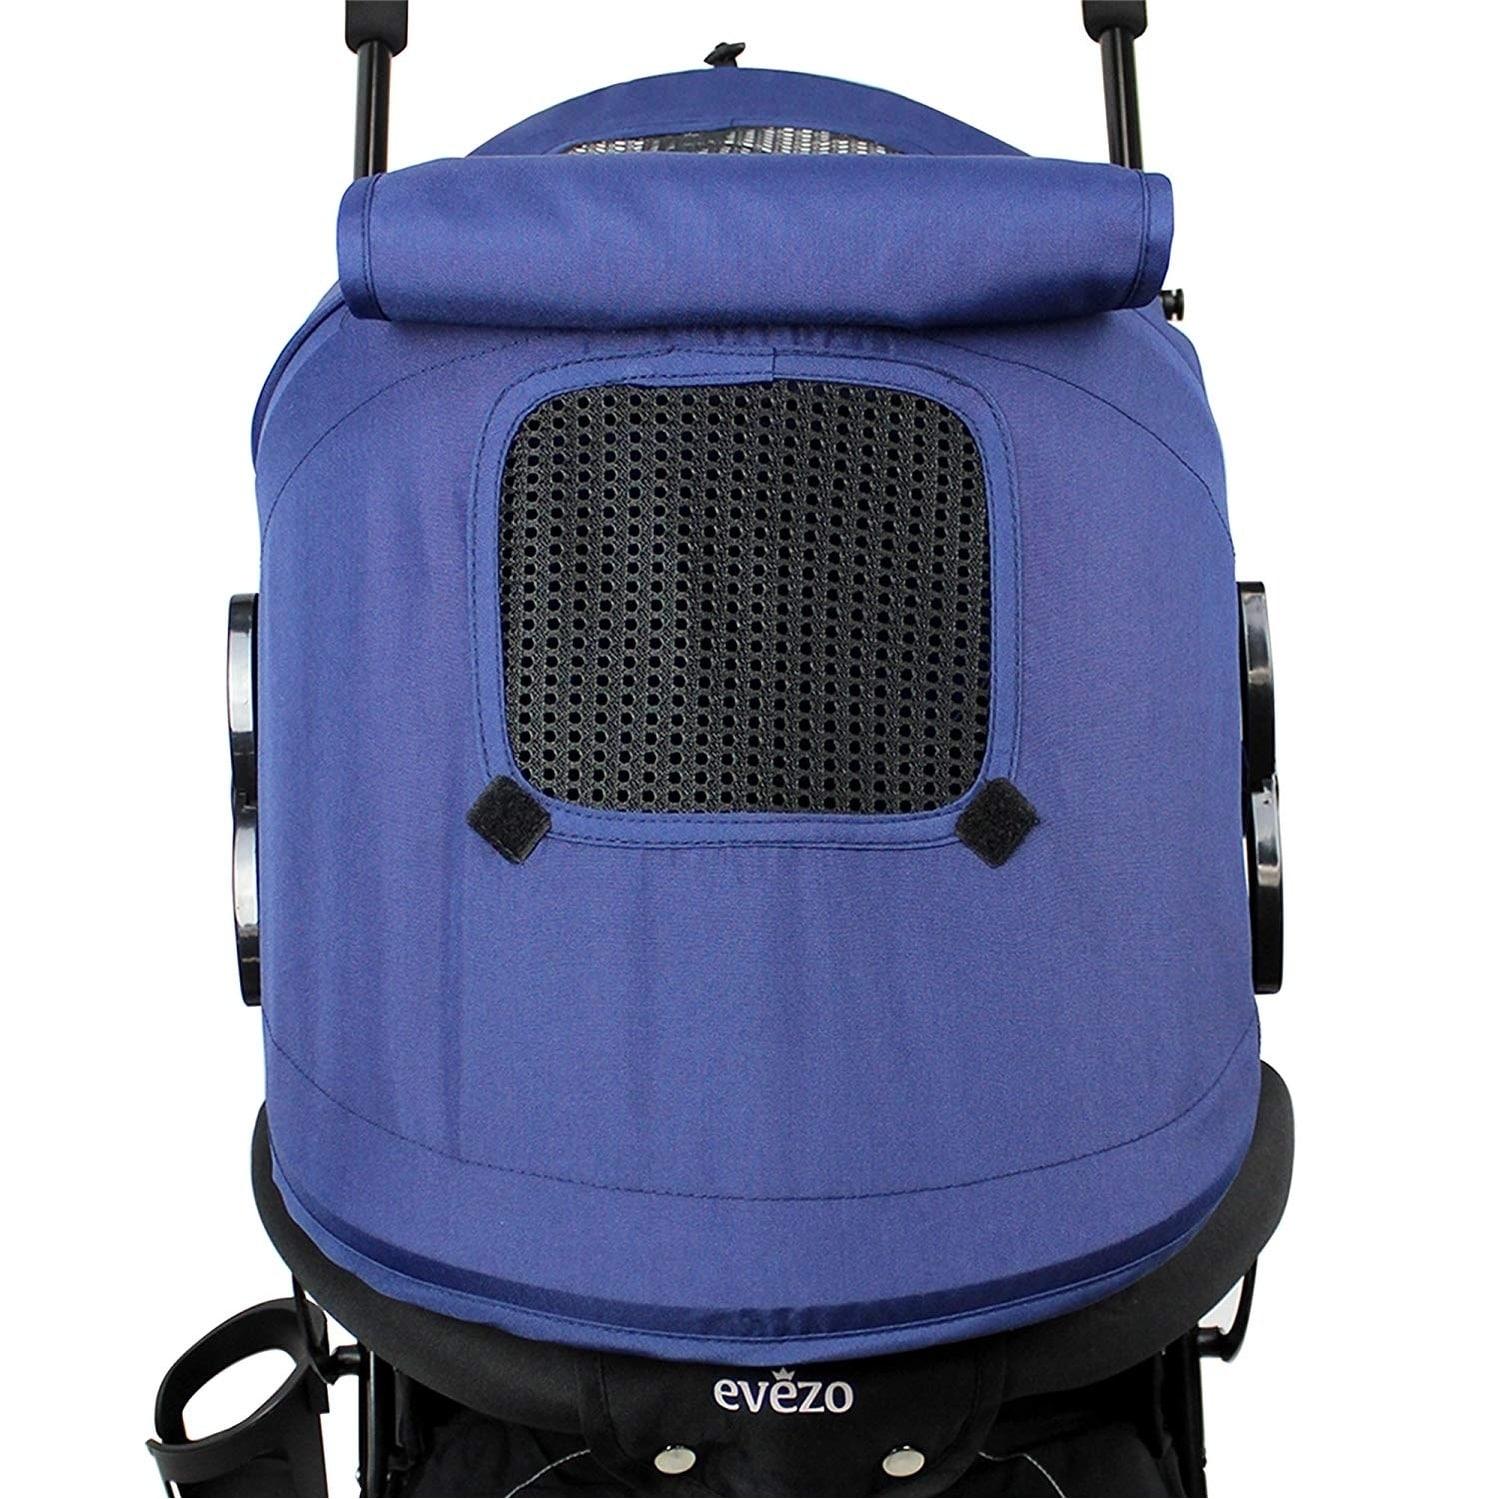 Evezo-Sander-ultra-lightweight-umbrella-stroller thumbnail 10